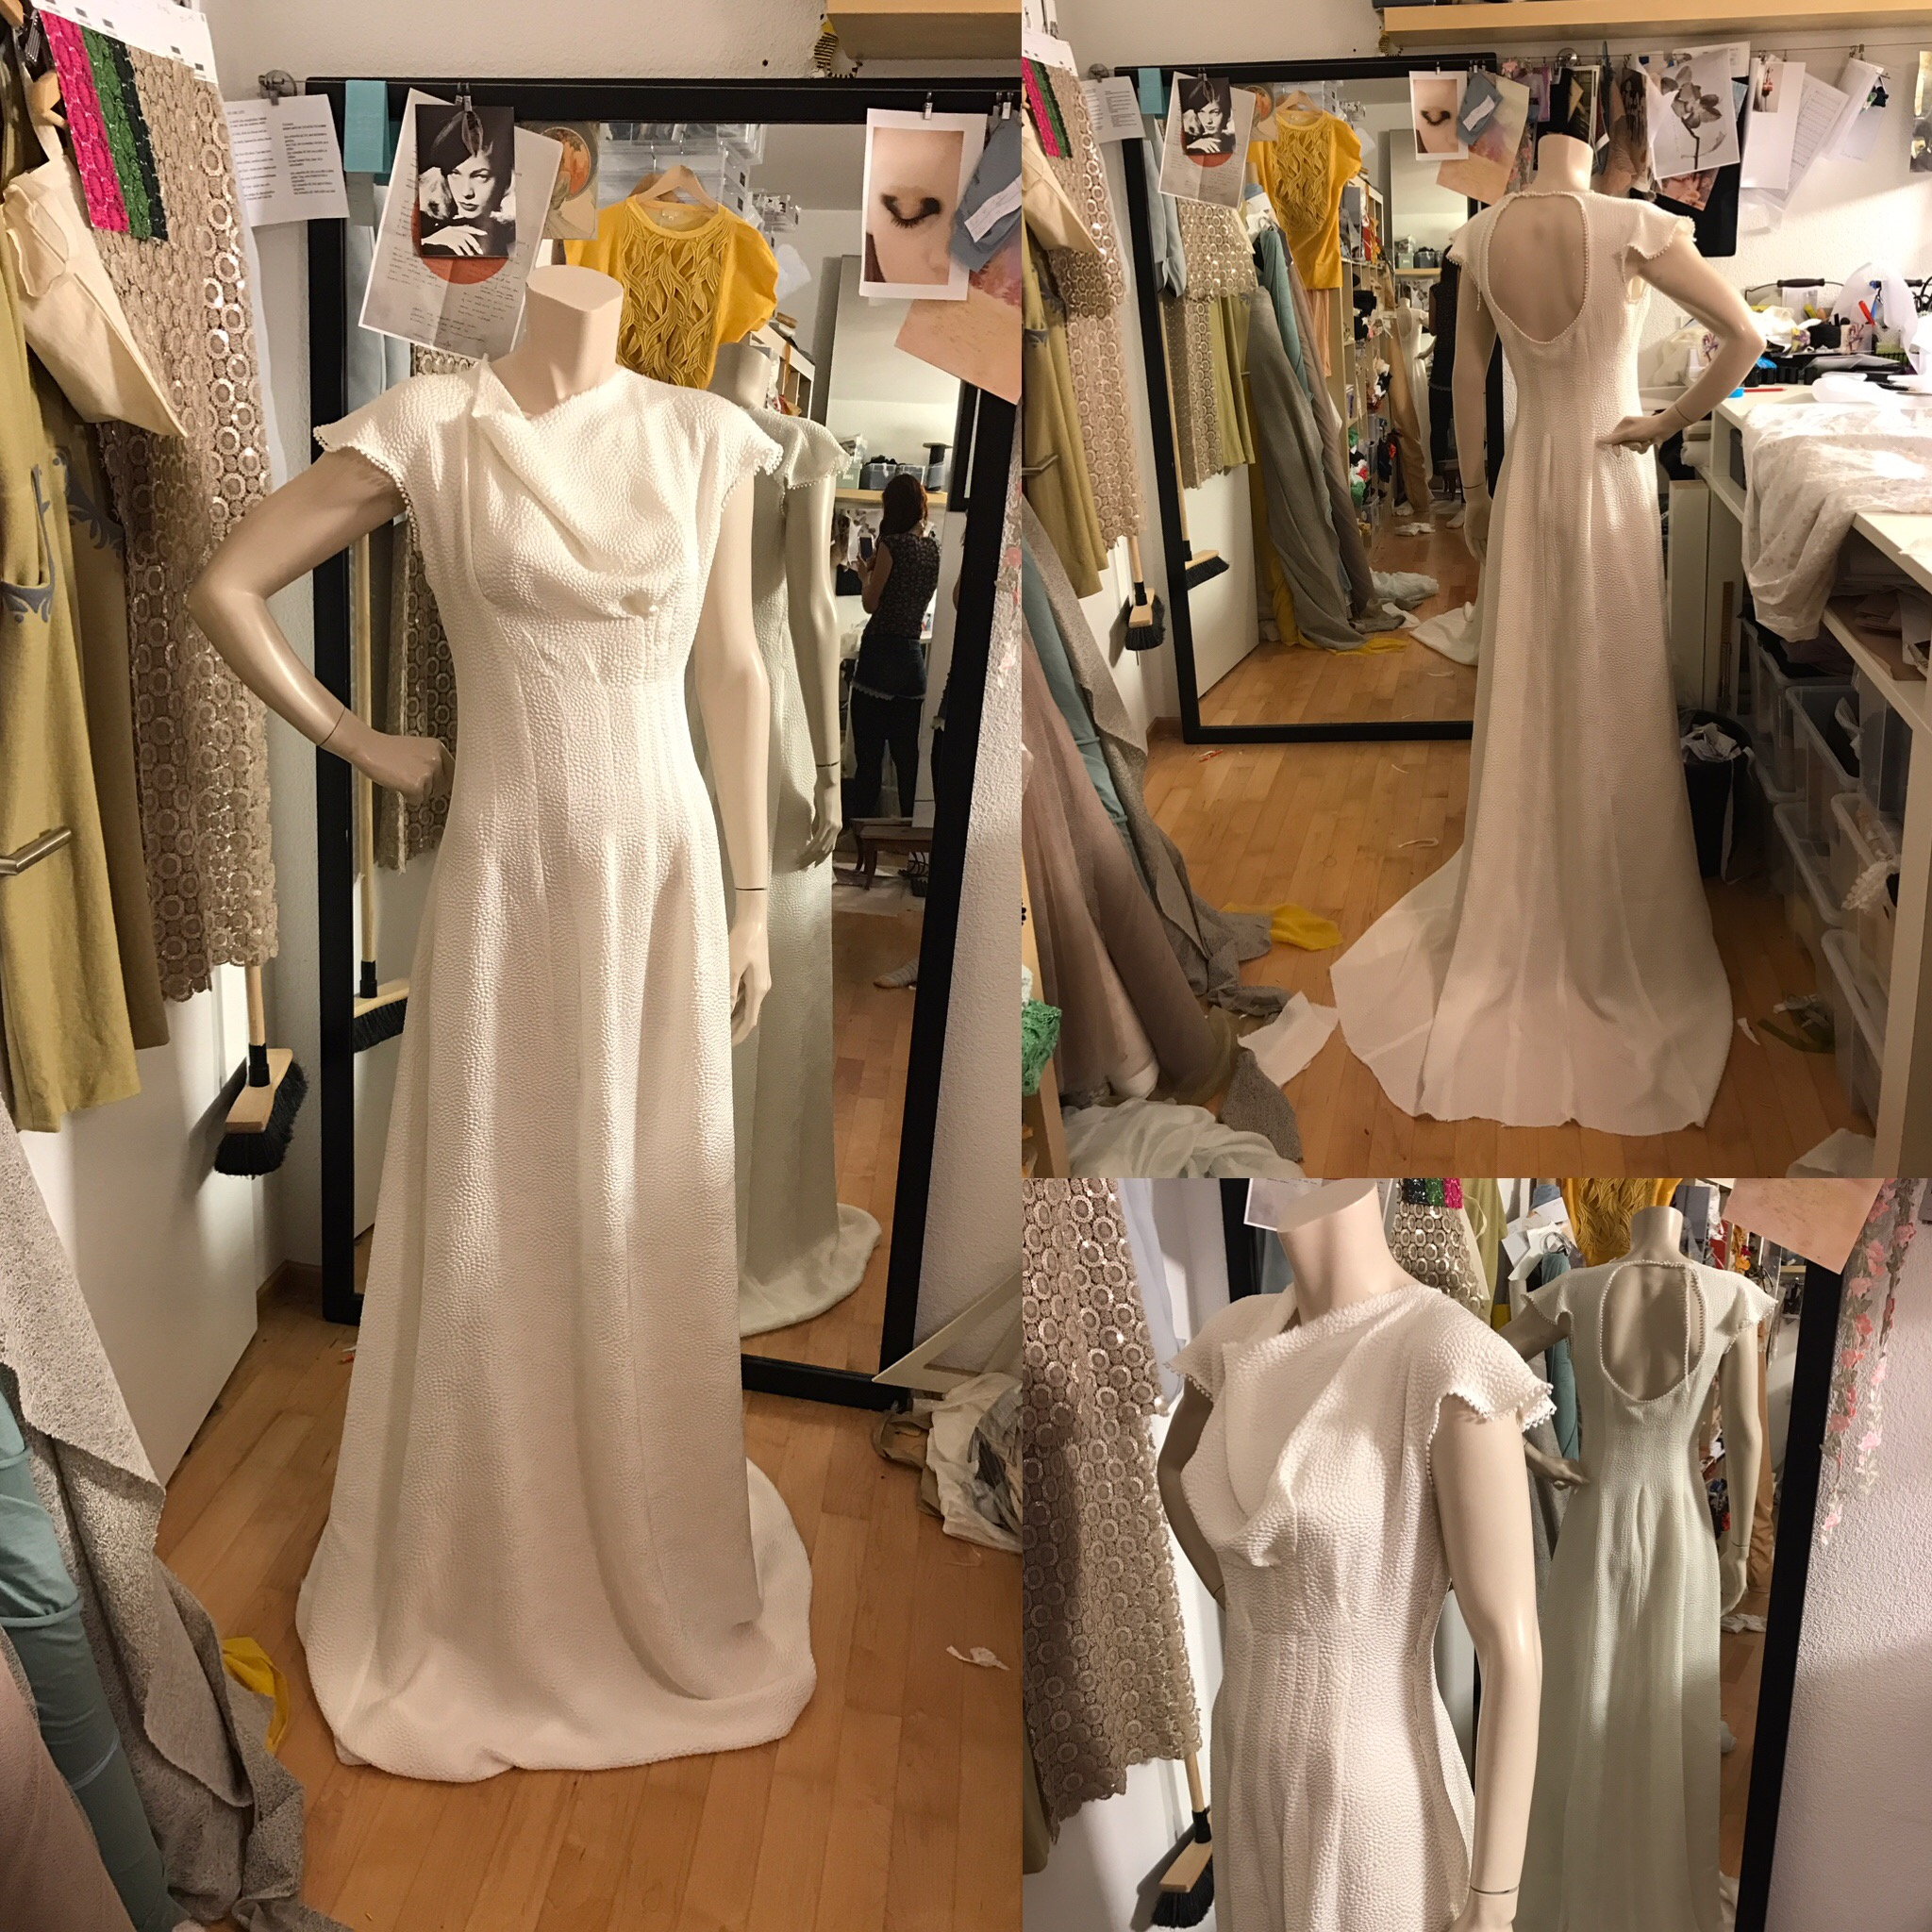 weddingdress_2017_silk_seam837F5953-E72A-4016-AF3F-902CEC7827EA.jpg